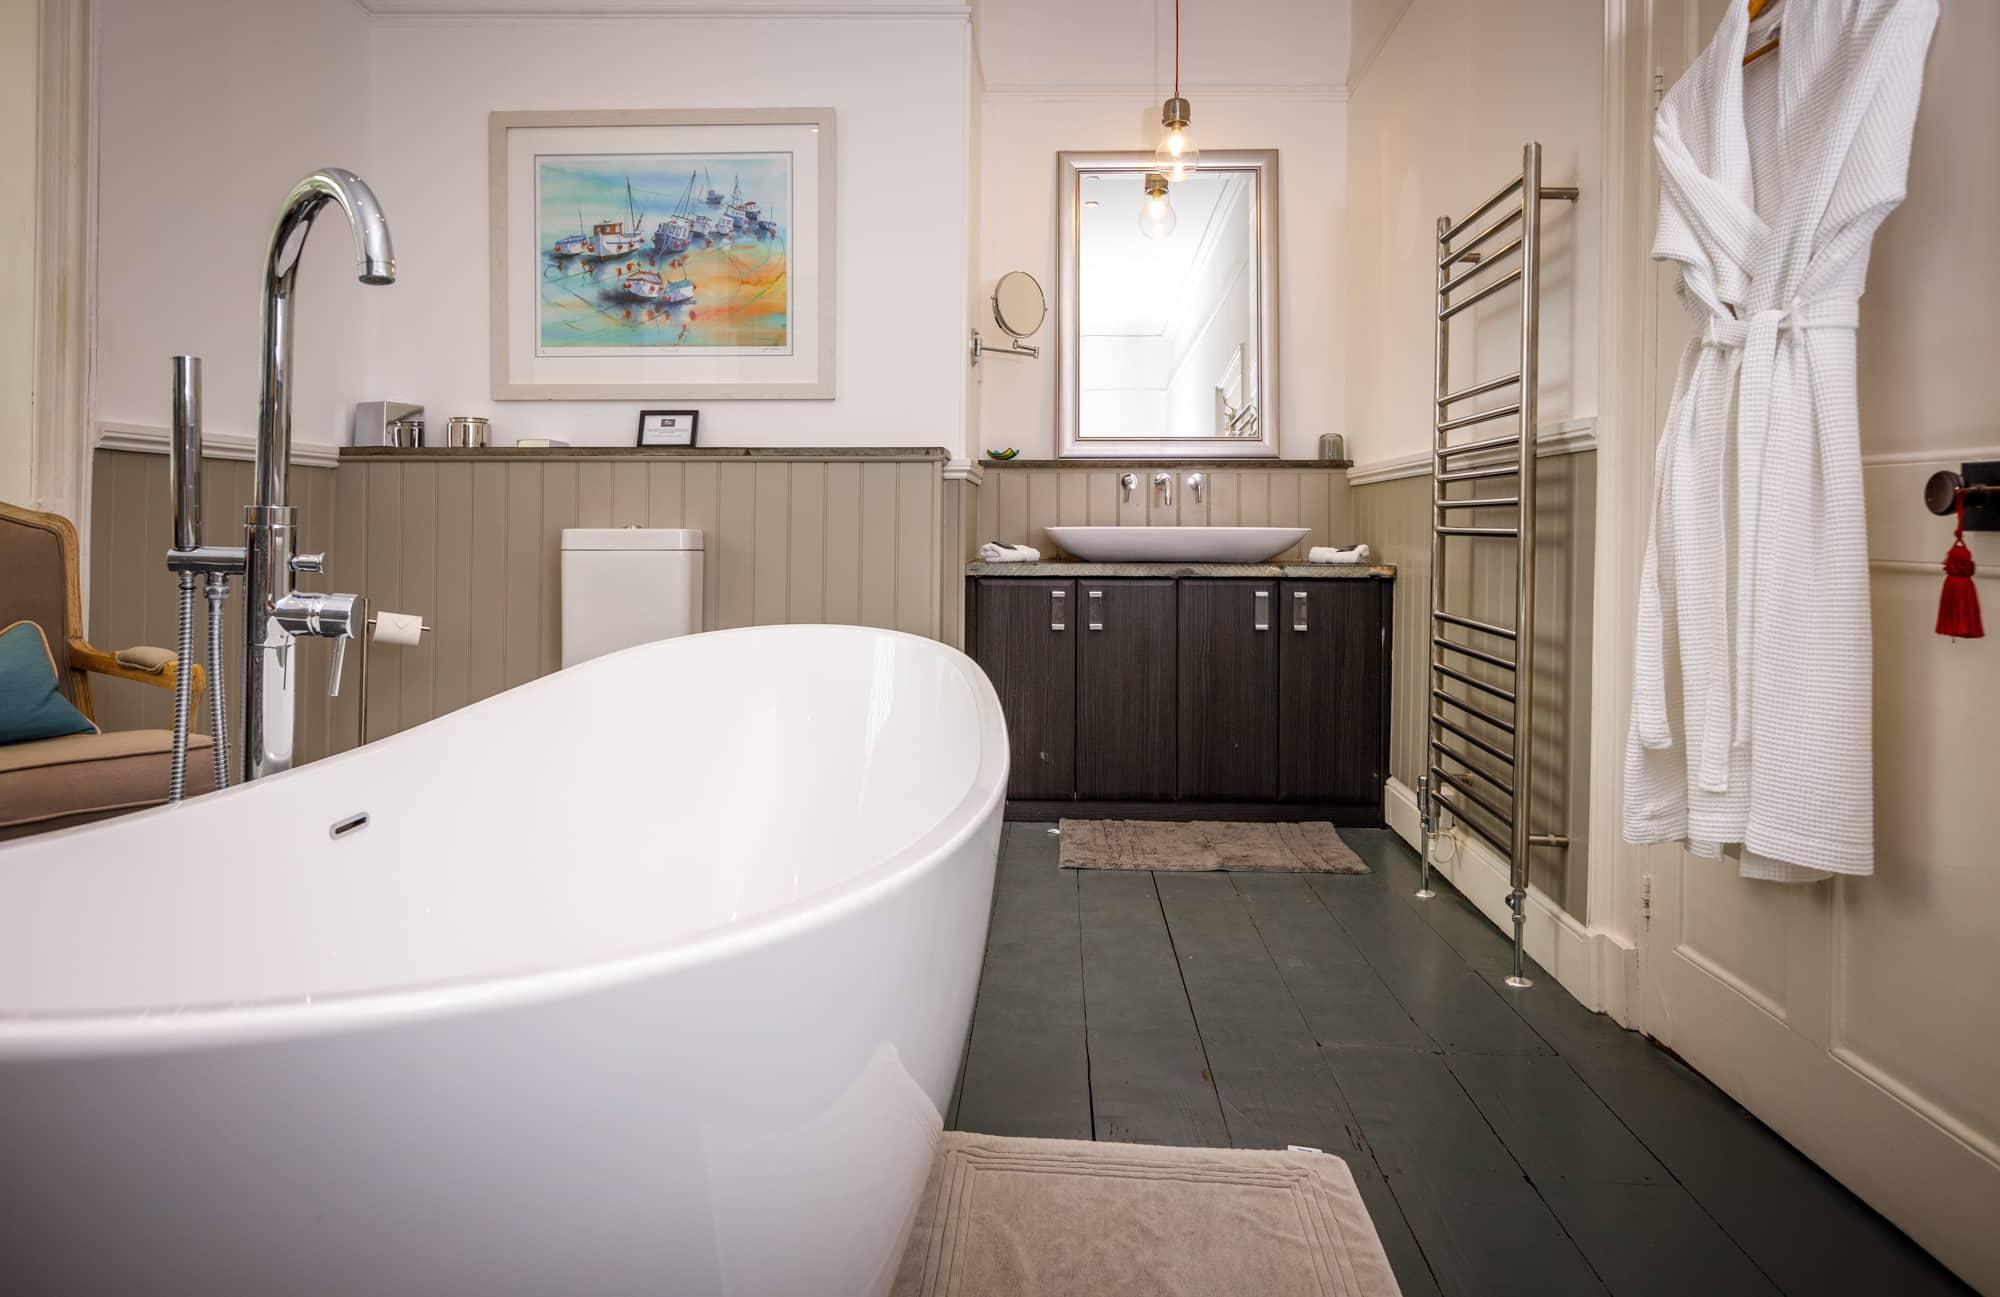 Porthilly - ensuite bath & sink-pichi